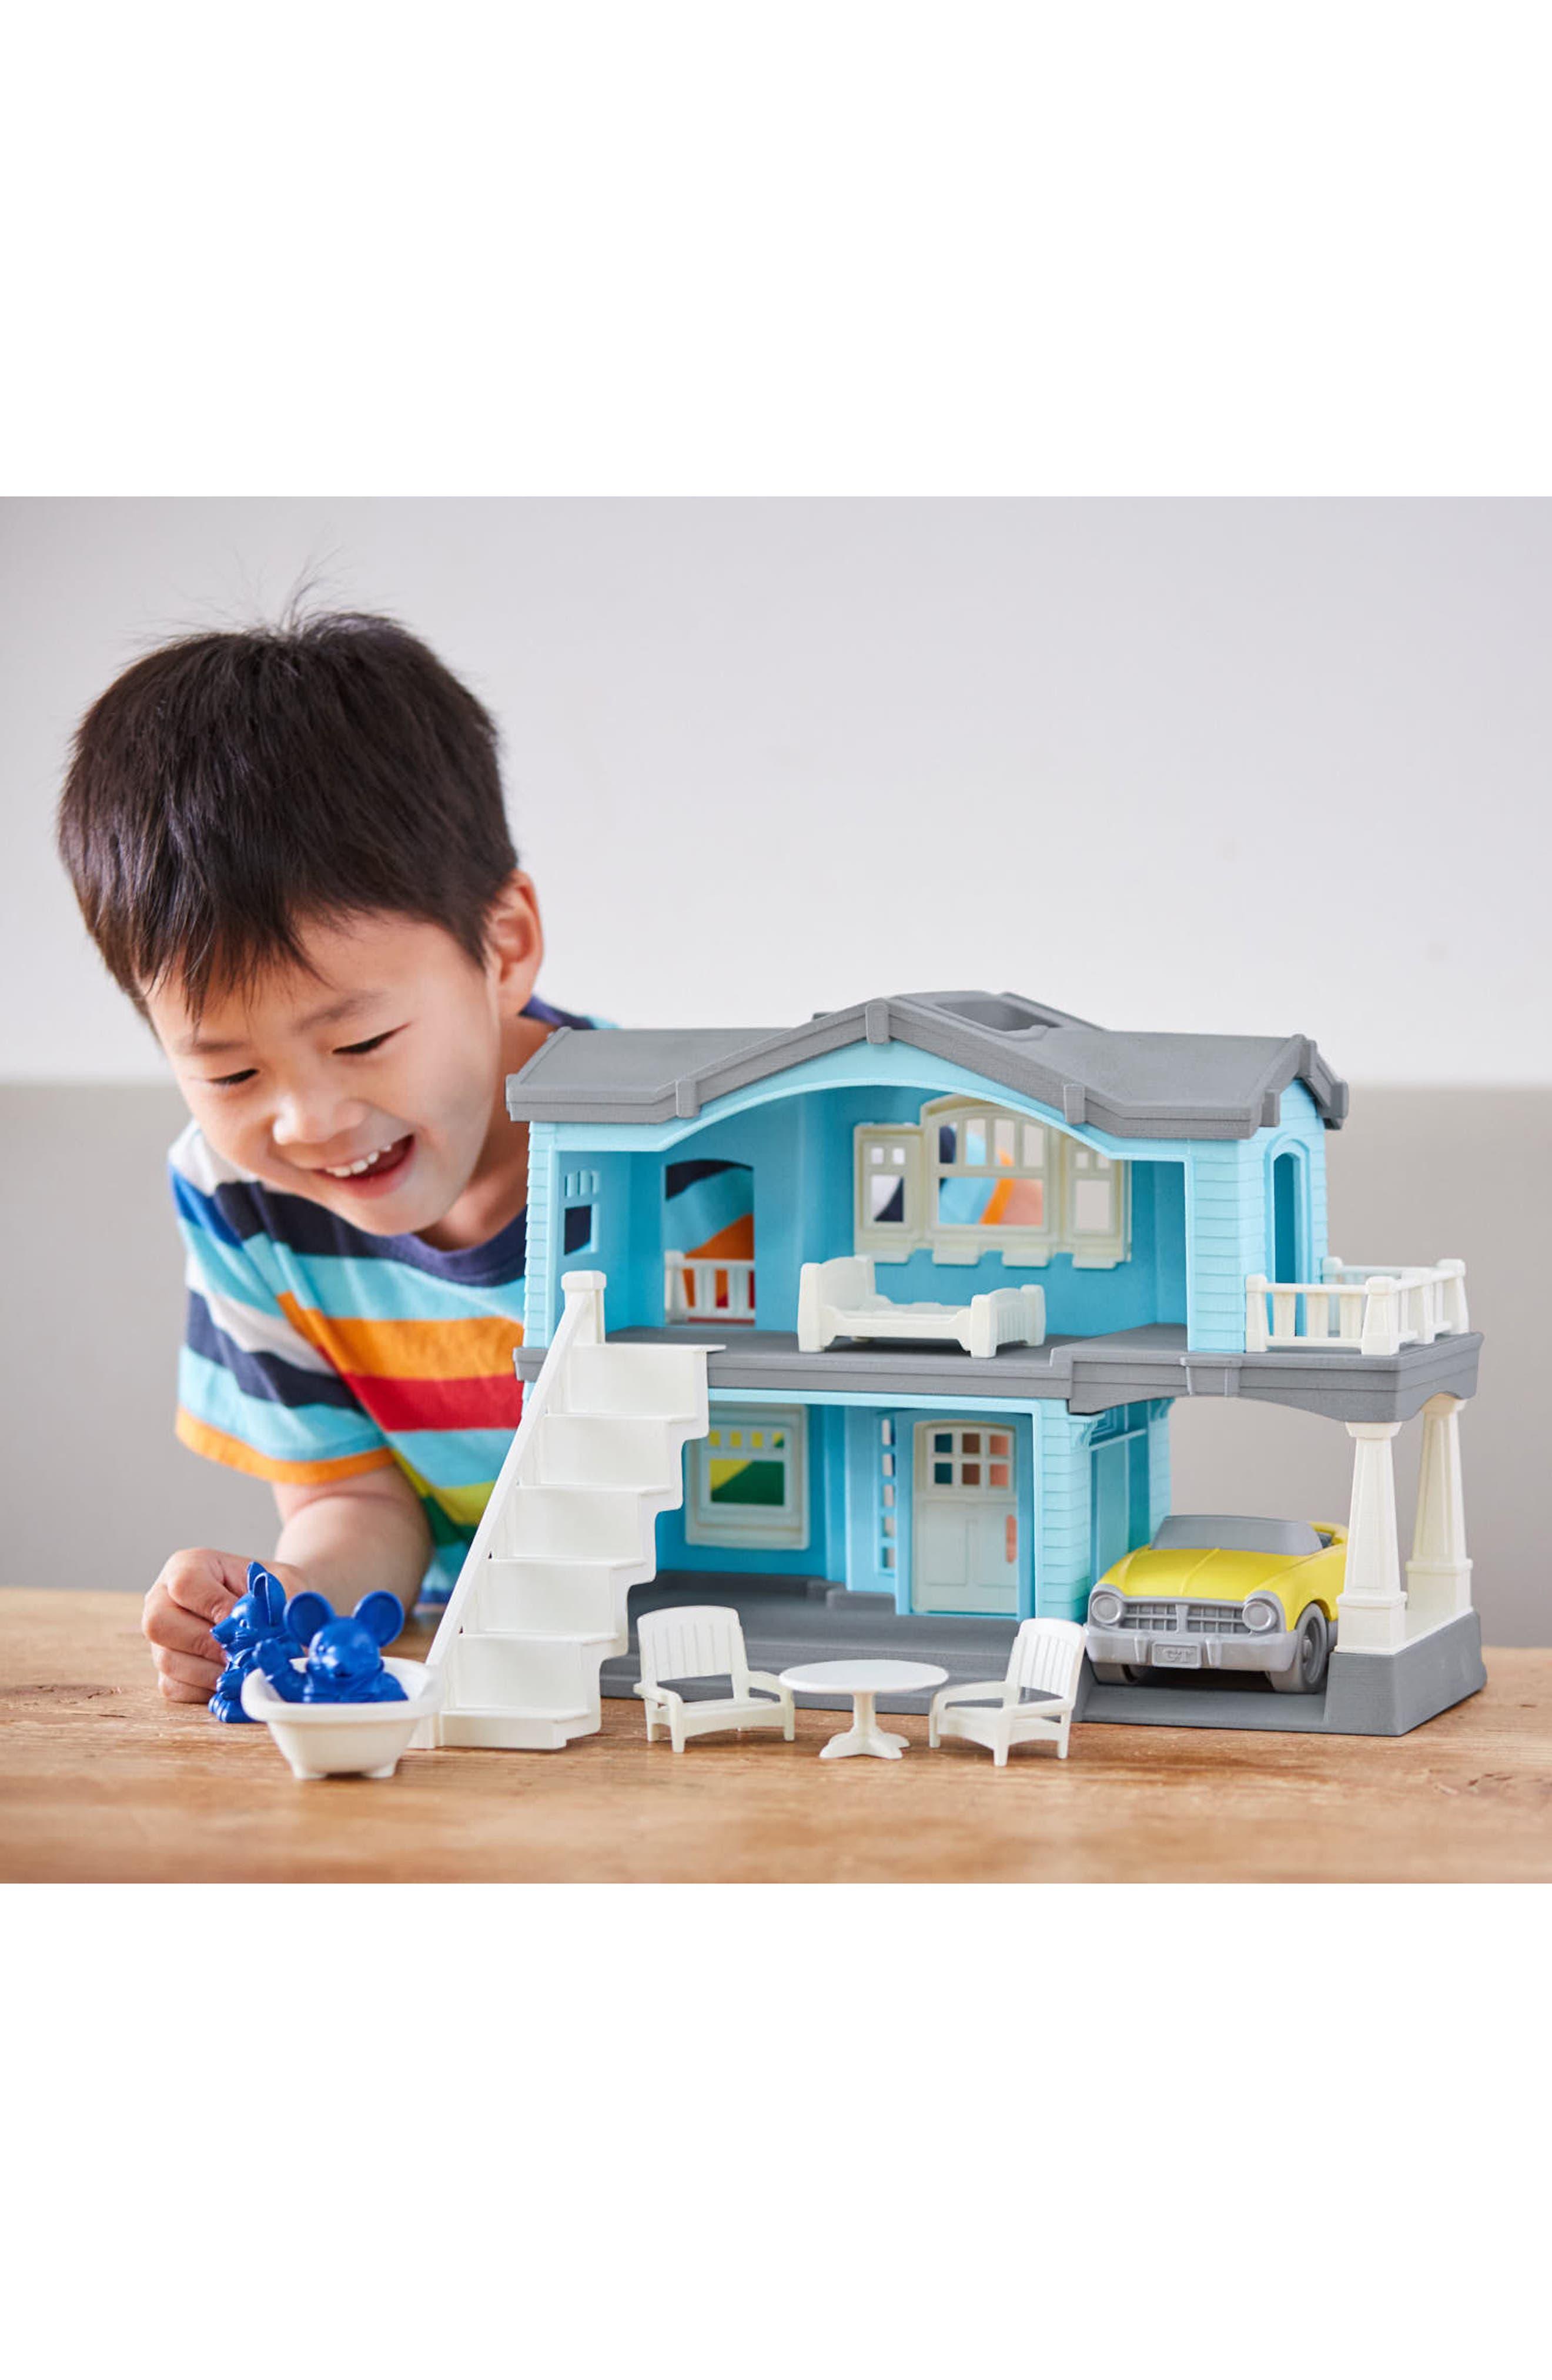 10-Piece House Play Set,                             Alternate thumbnail 6, color,                             450